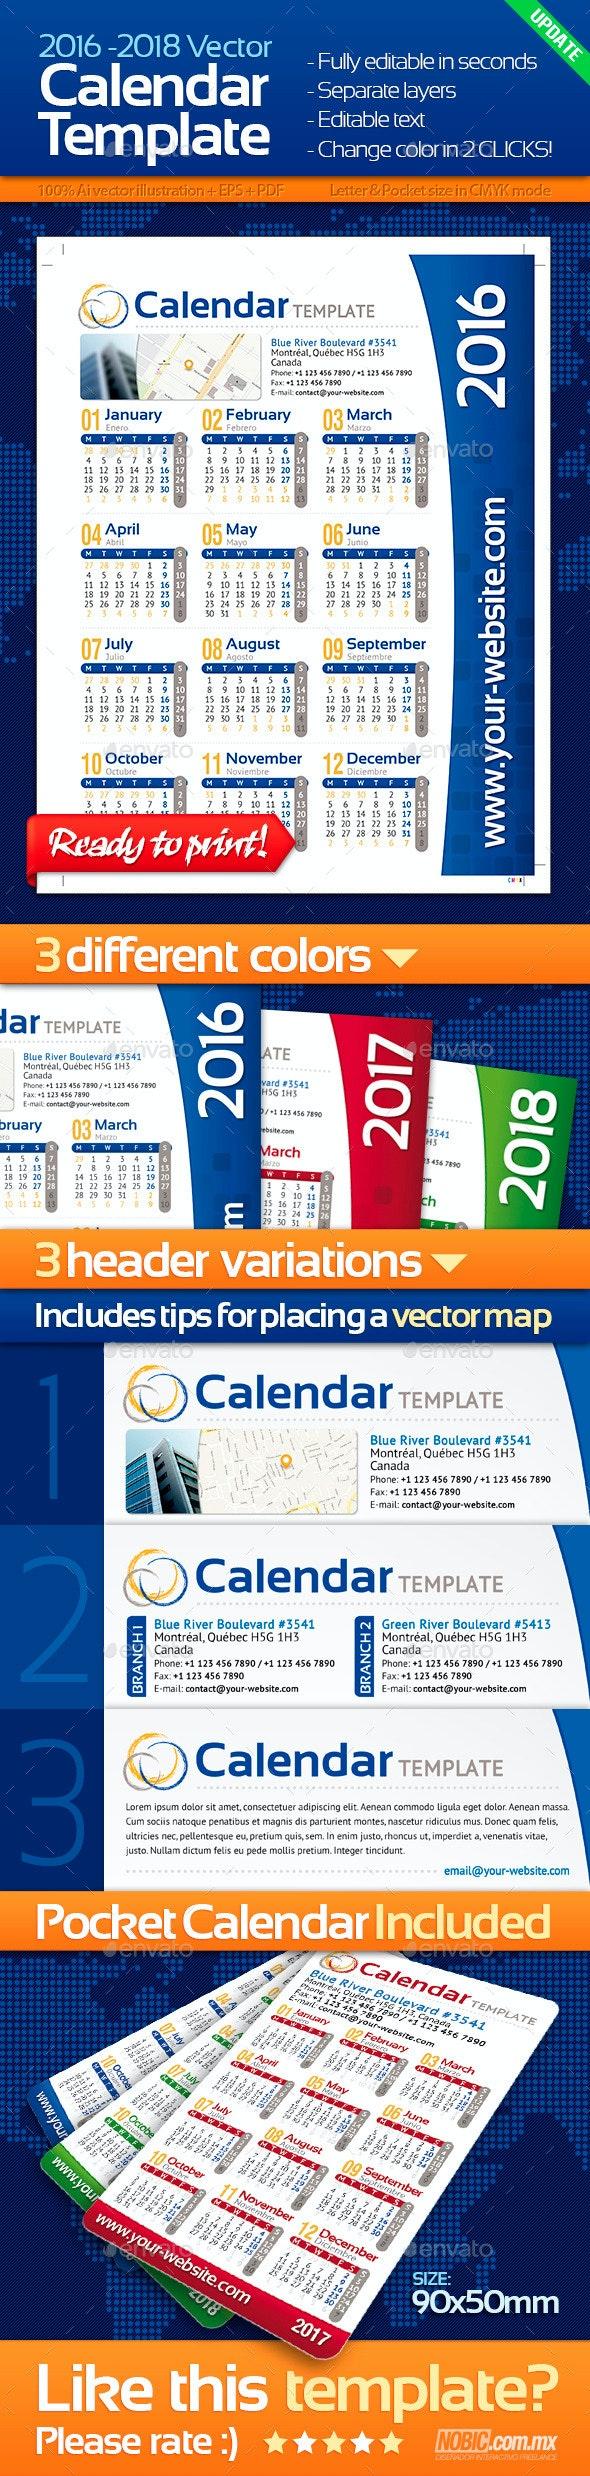 2016, 2017 and 2018 Calendar Template - Calendars Stationery